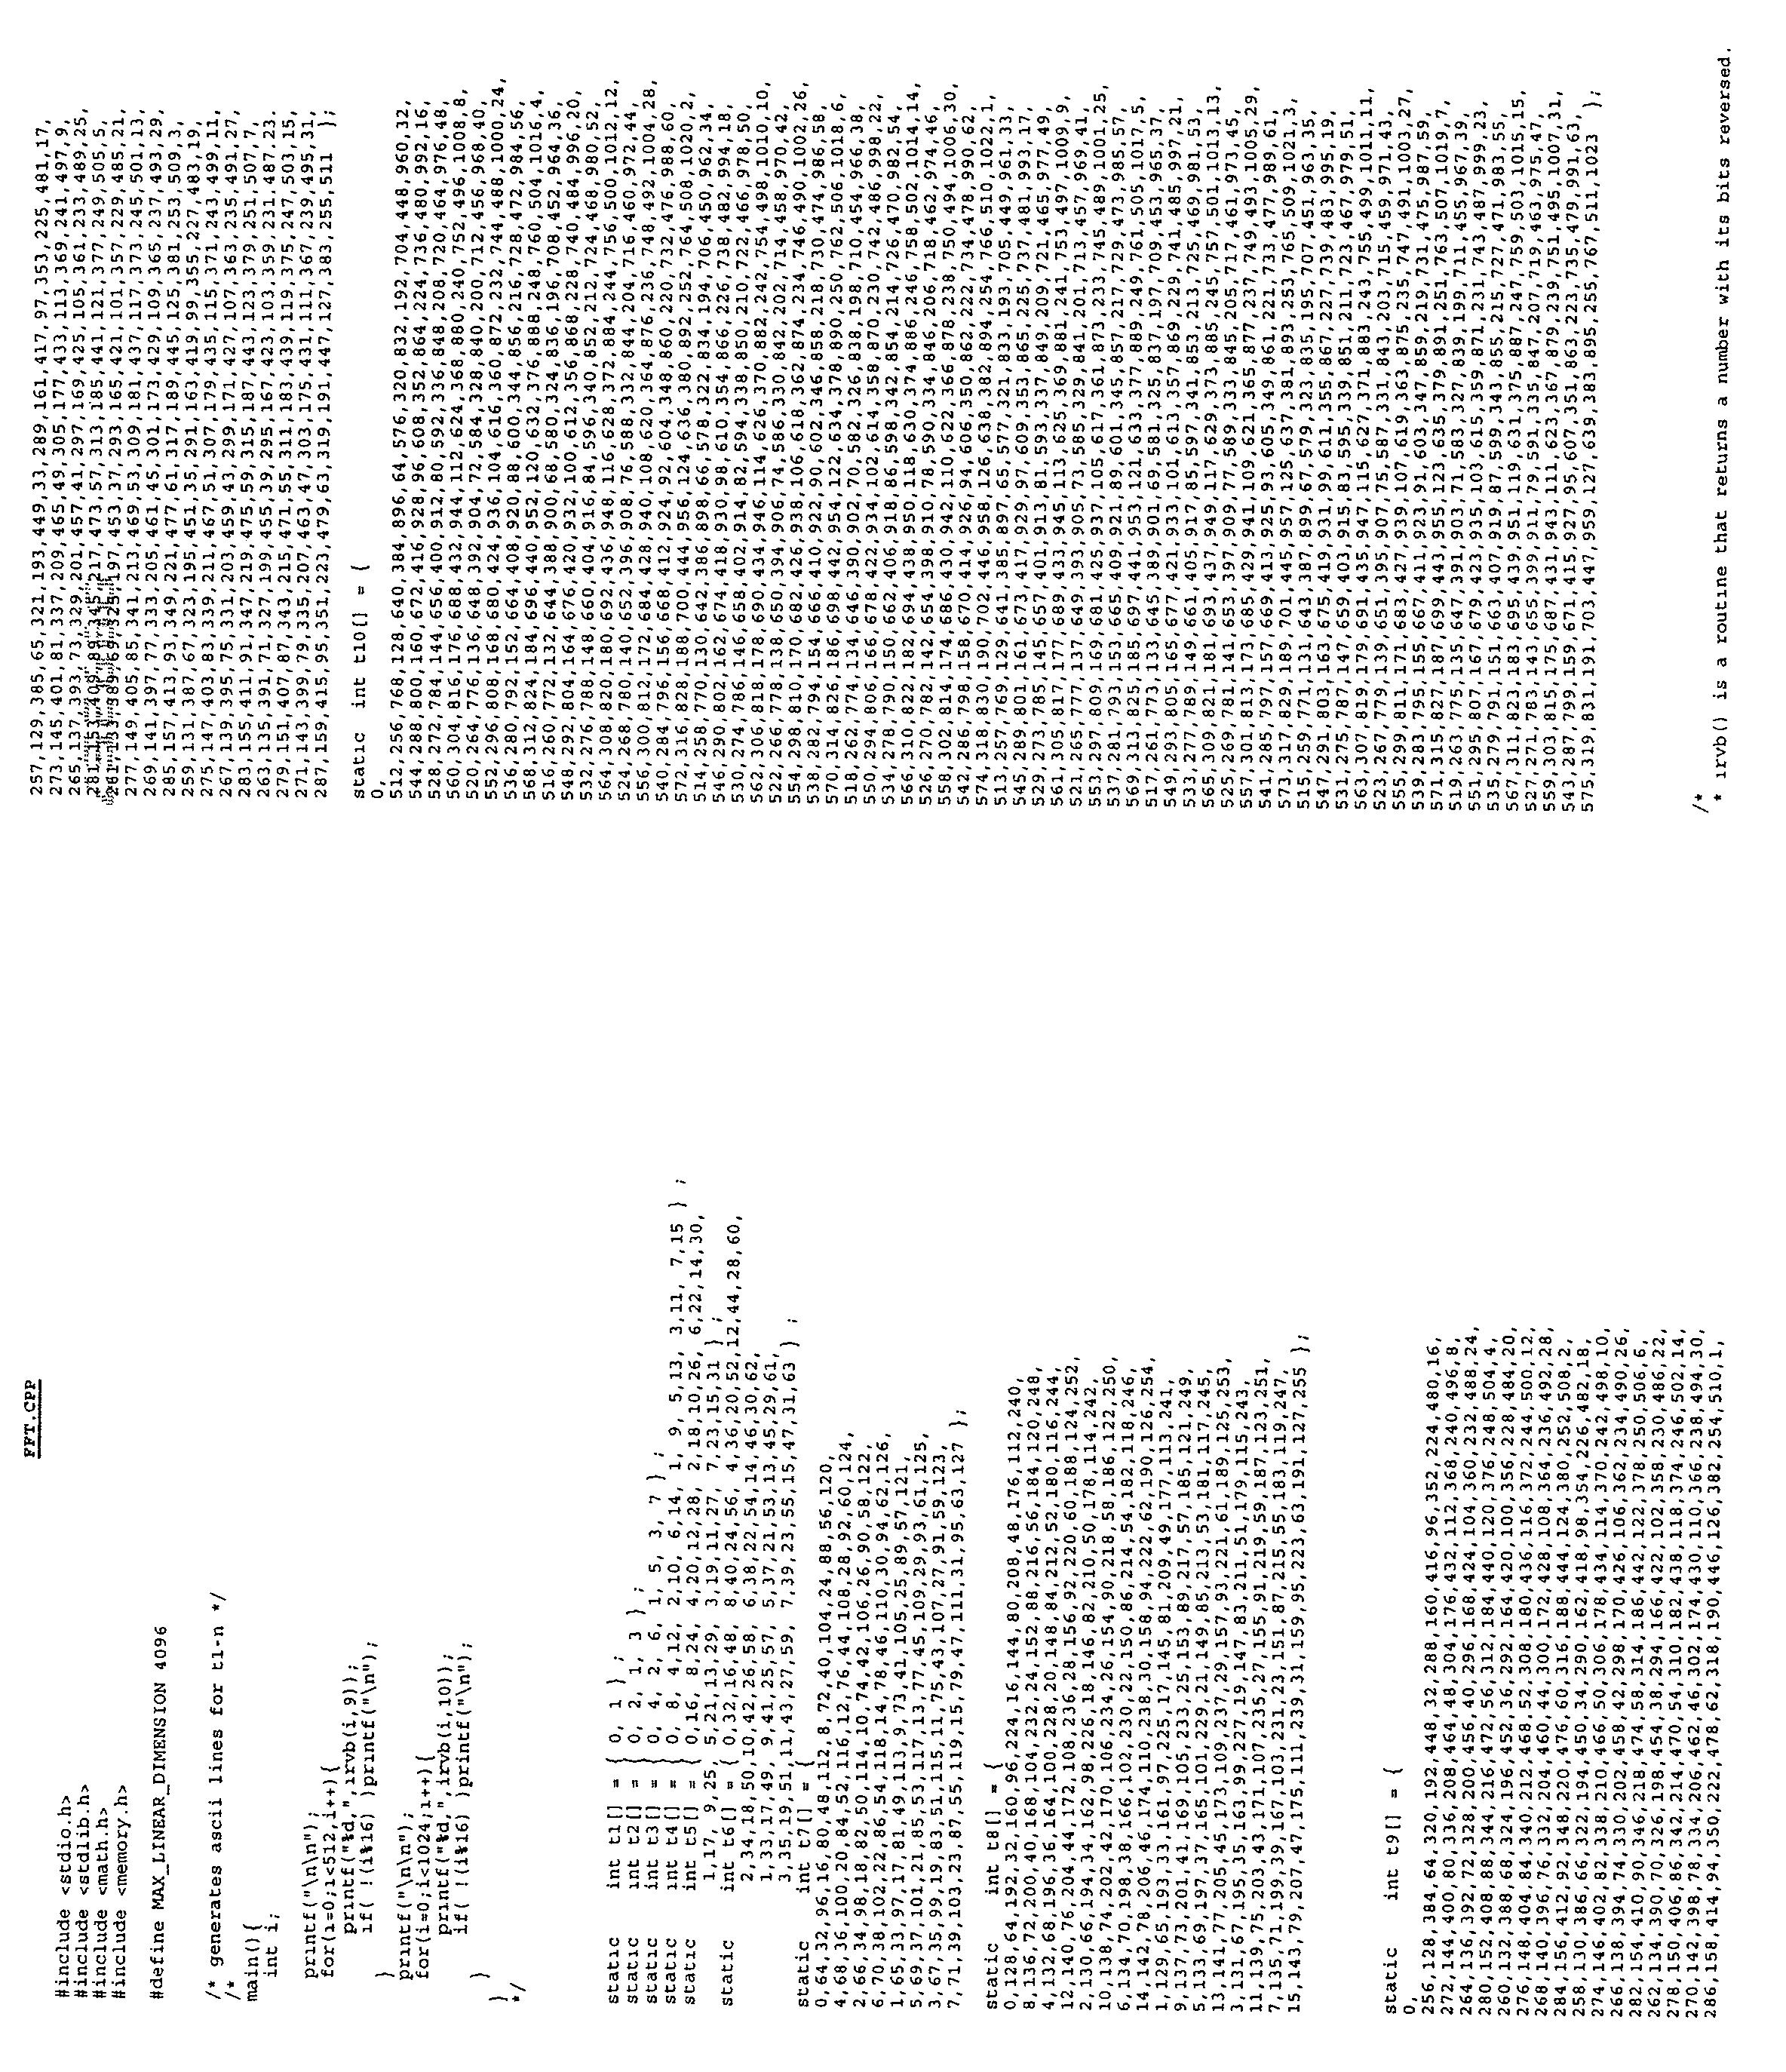 Figure US20020118831A1-20020829-P00101